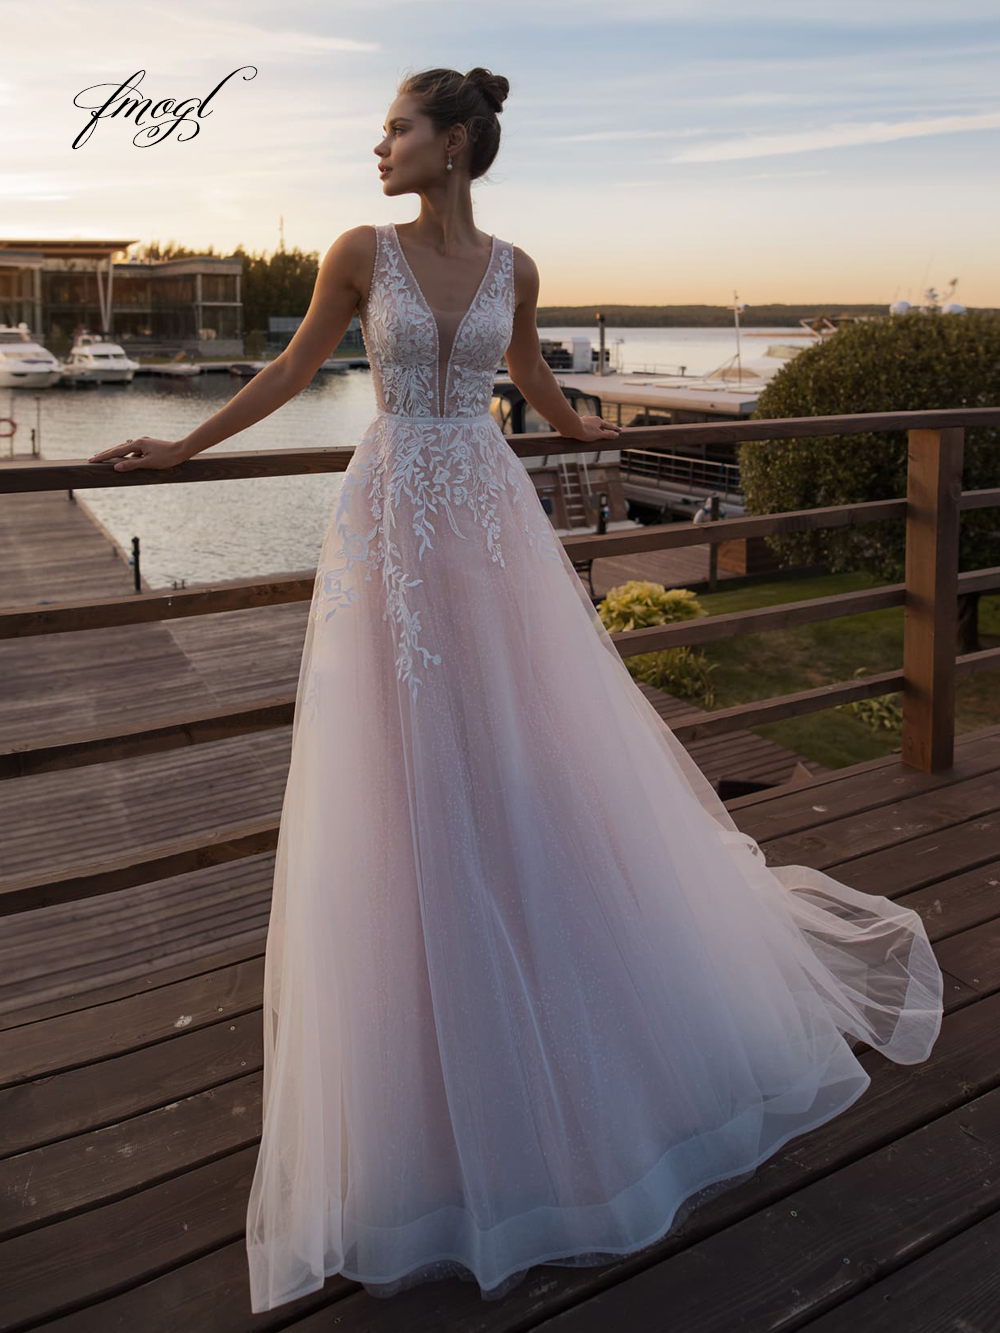 Fmogl Sexy Illusion V Neck Tank Beach Wedding Dresses 2019 Elegant Appliques Beaded Sweep Train Vintage Bridal Gowns Plus Size